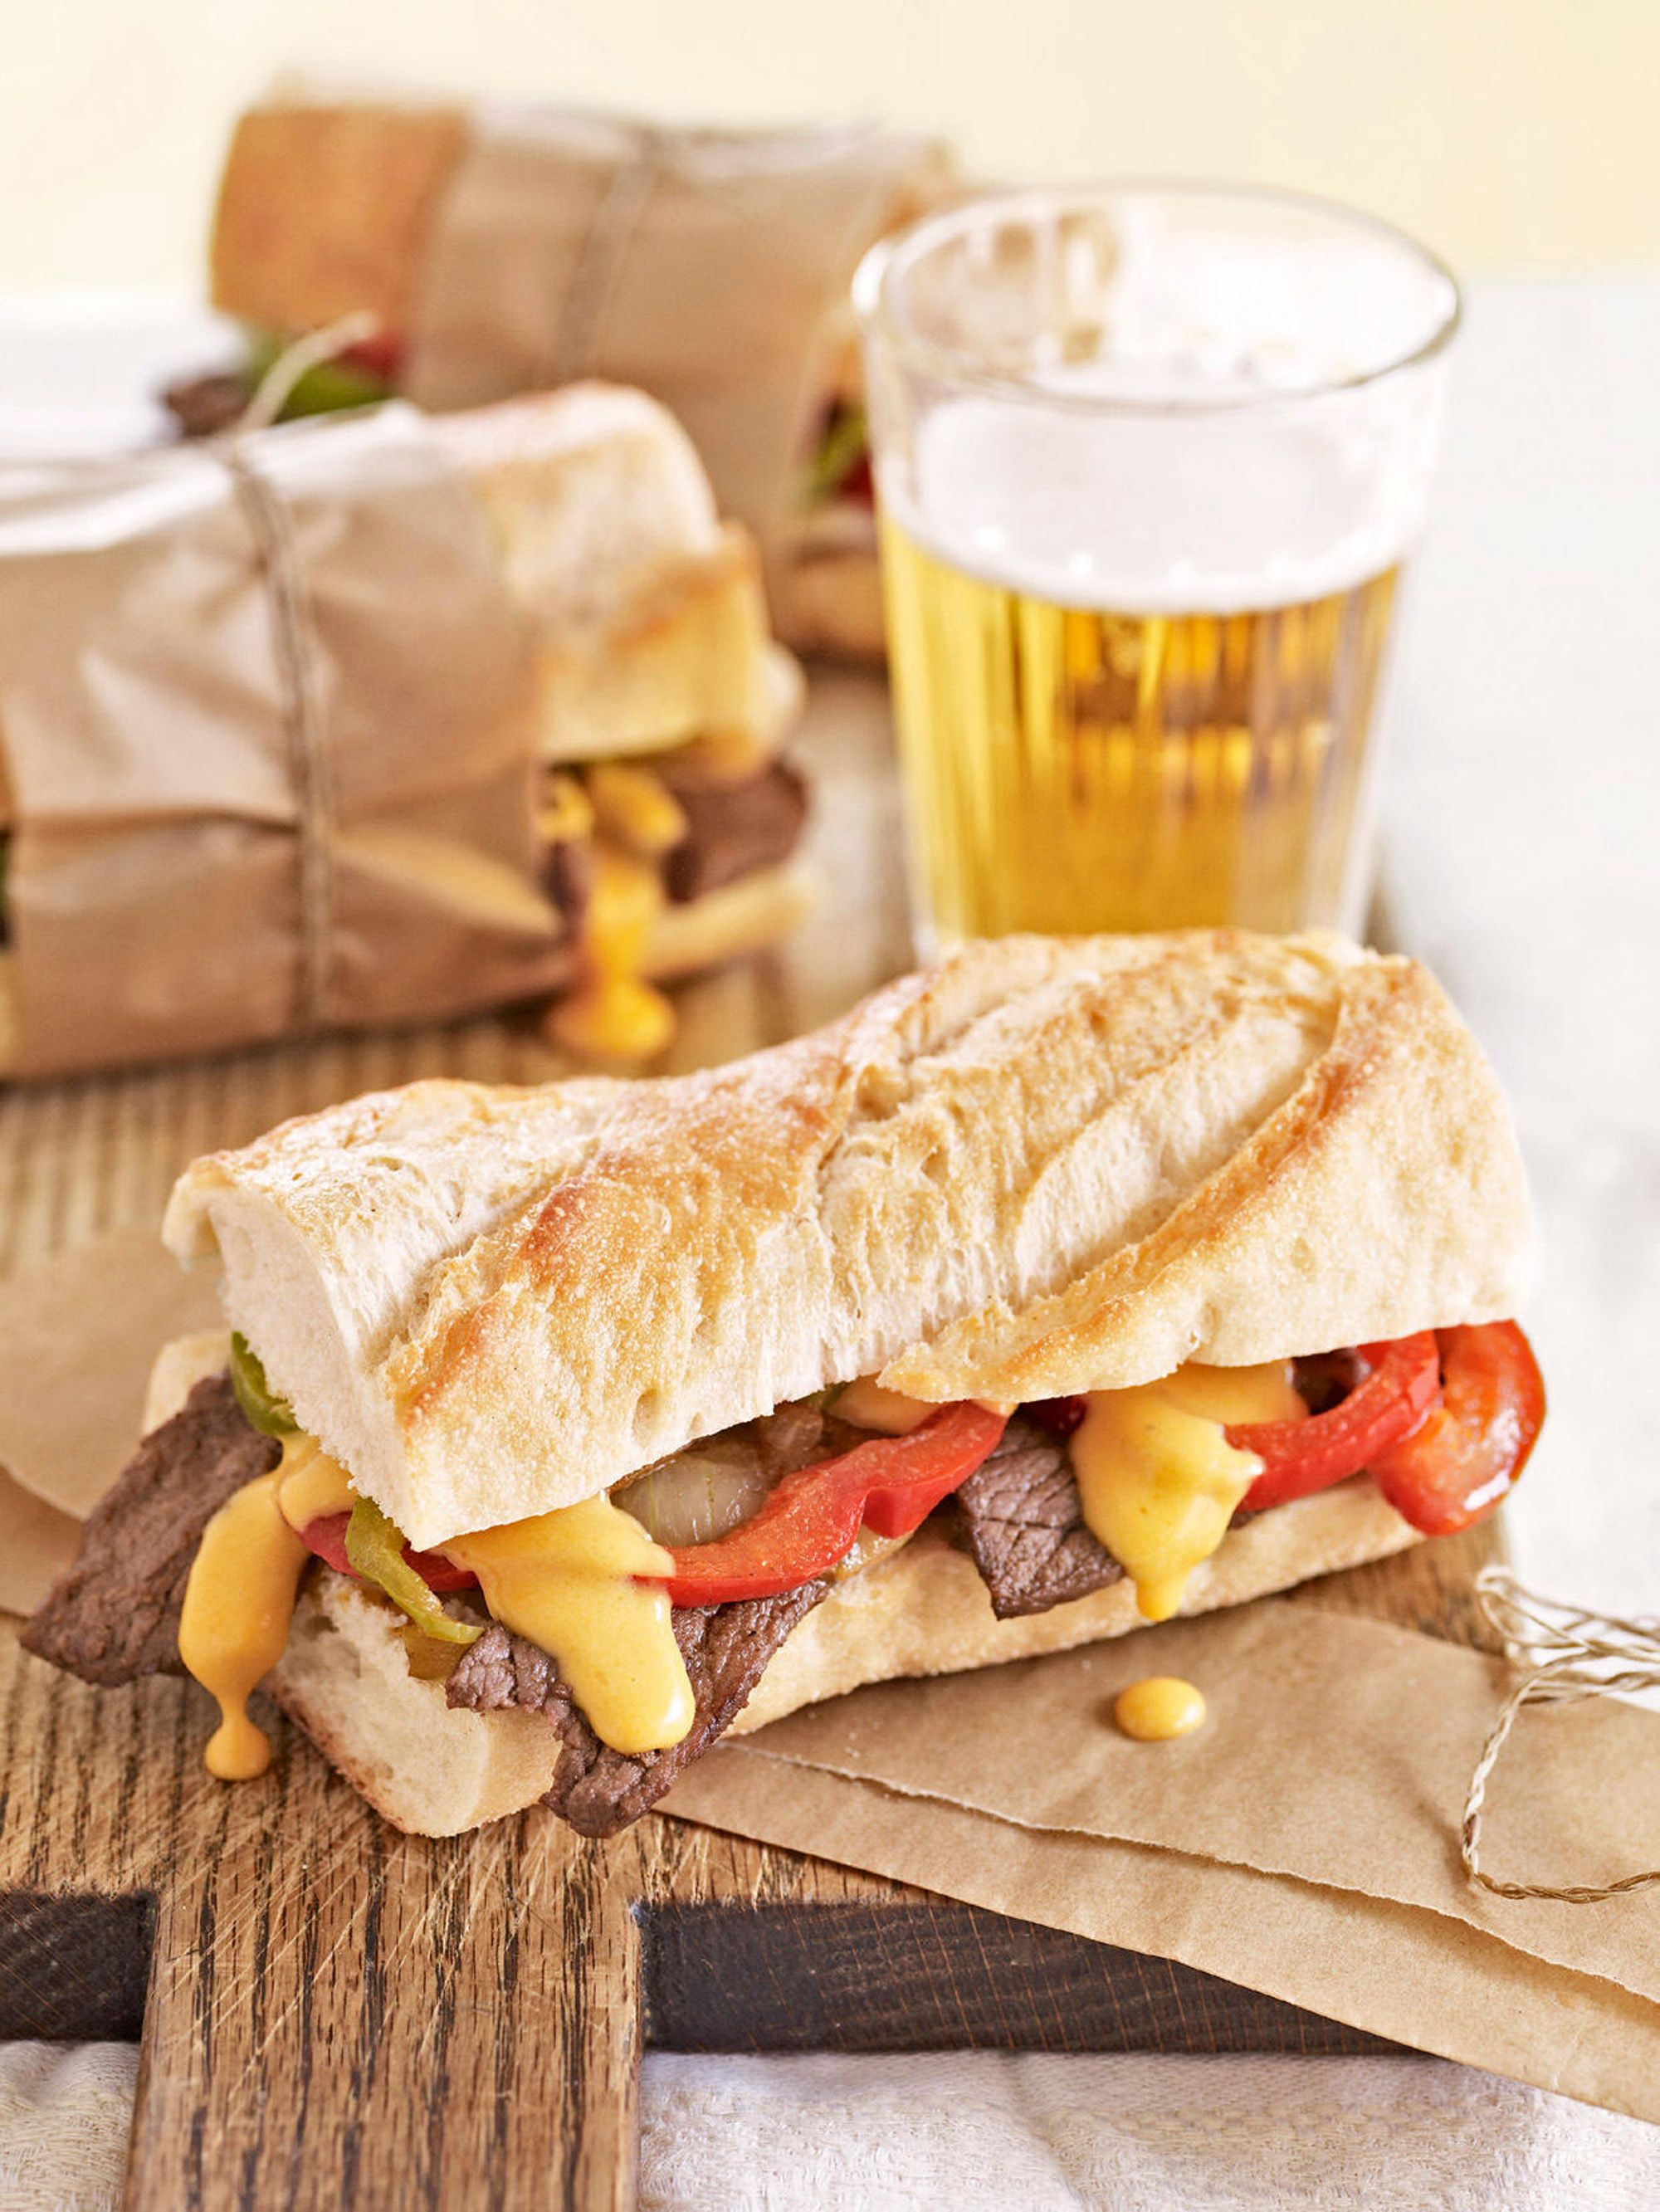 30 Best Sandwich Recipes for Summer - Lunch Sandwich Ideas